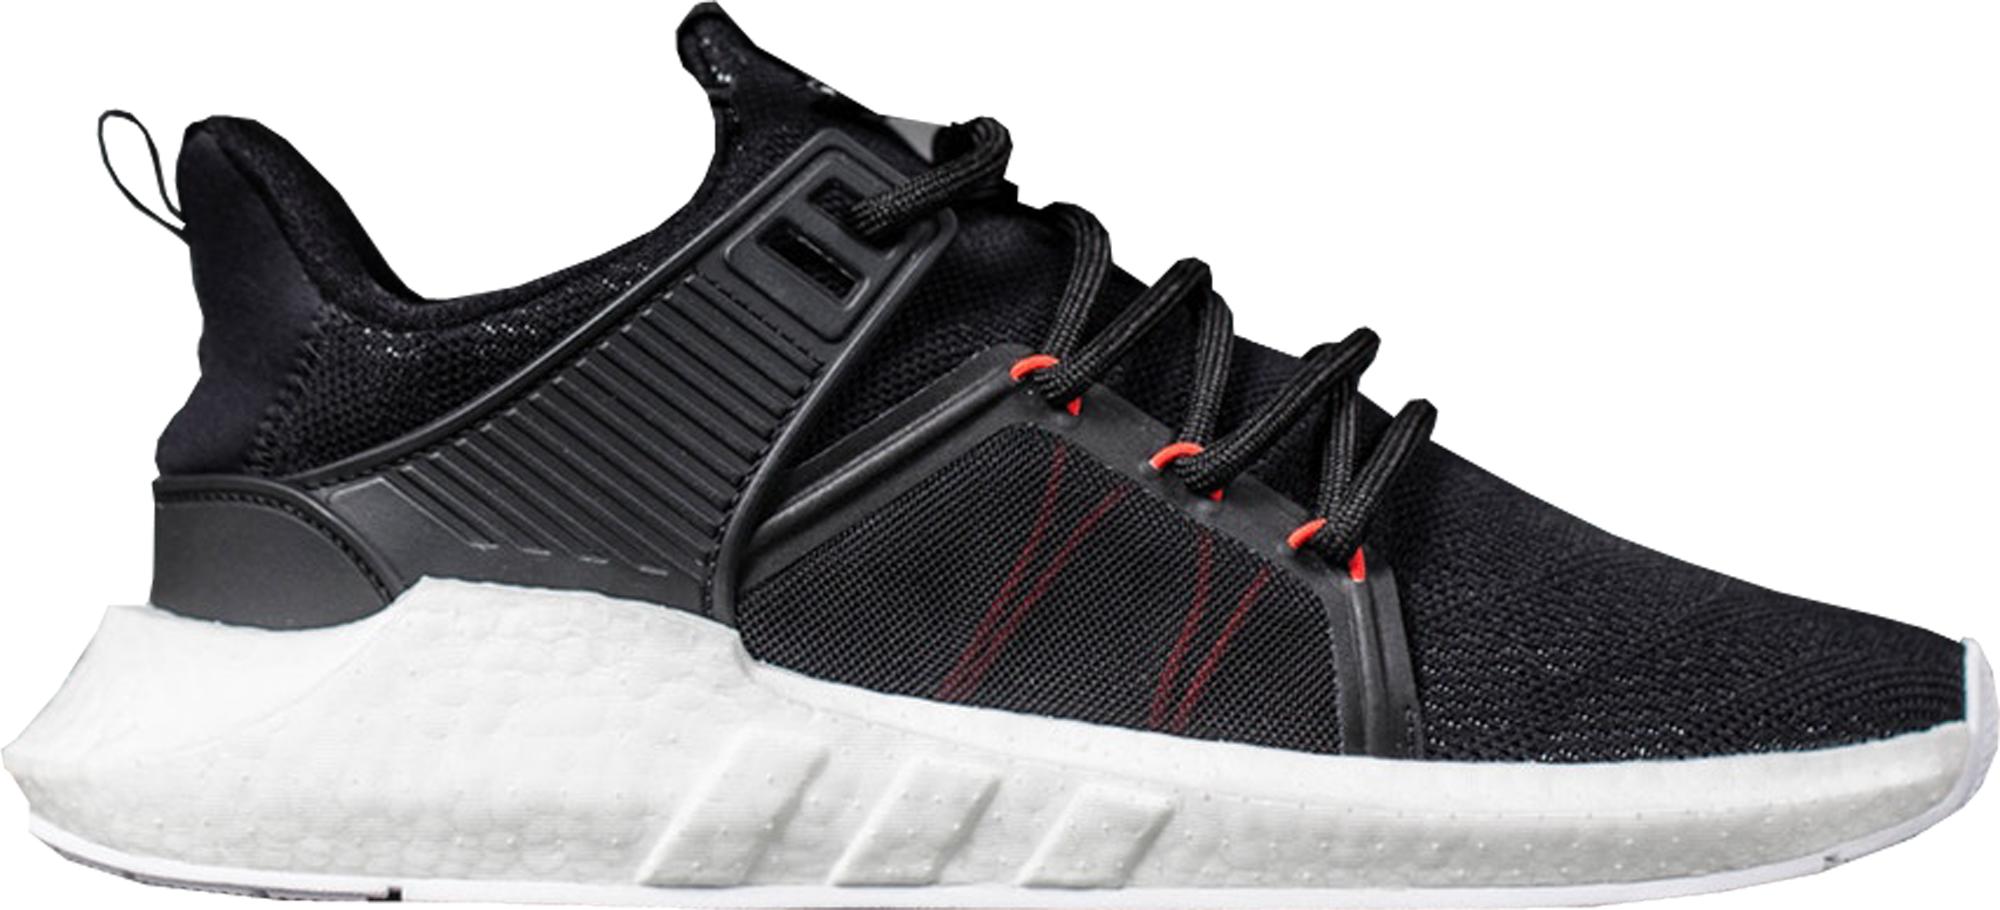 adidas EQT Support Future Bait R&D Black